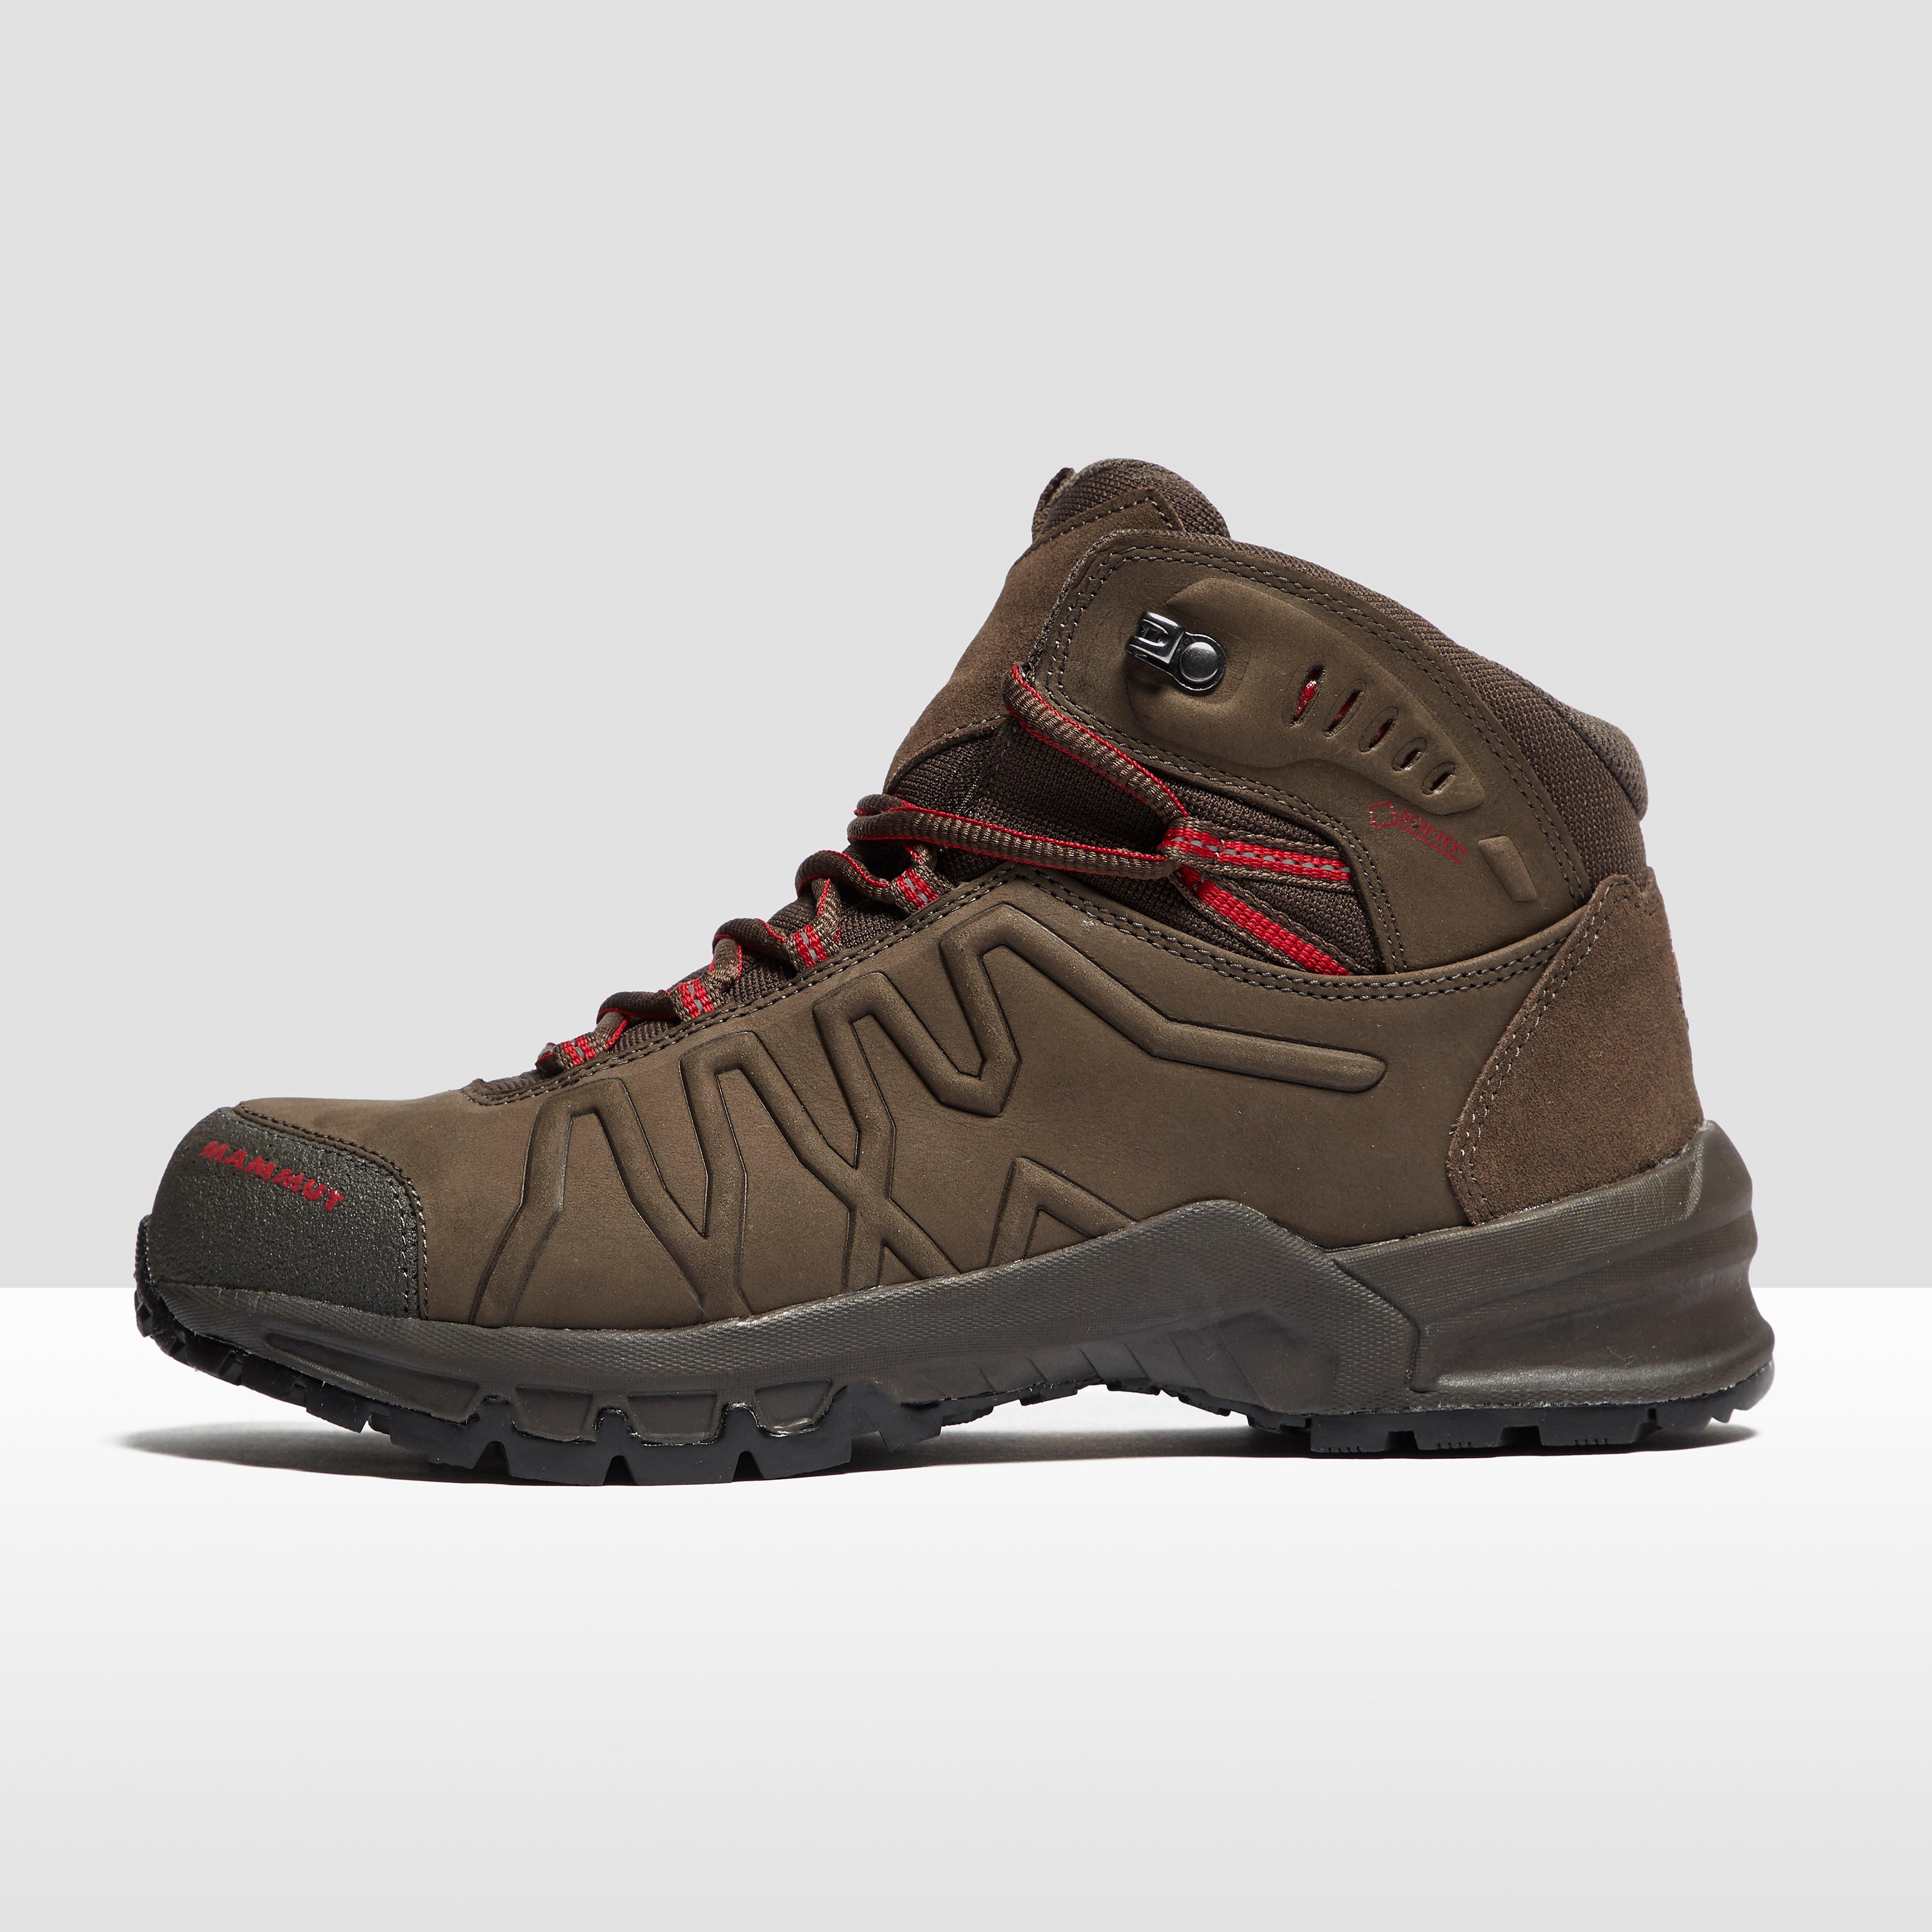 Mammut Mercury Mid II Men's Hiking Boot